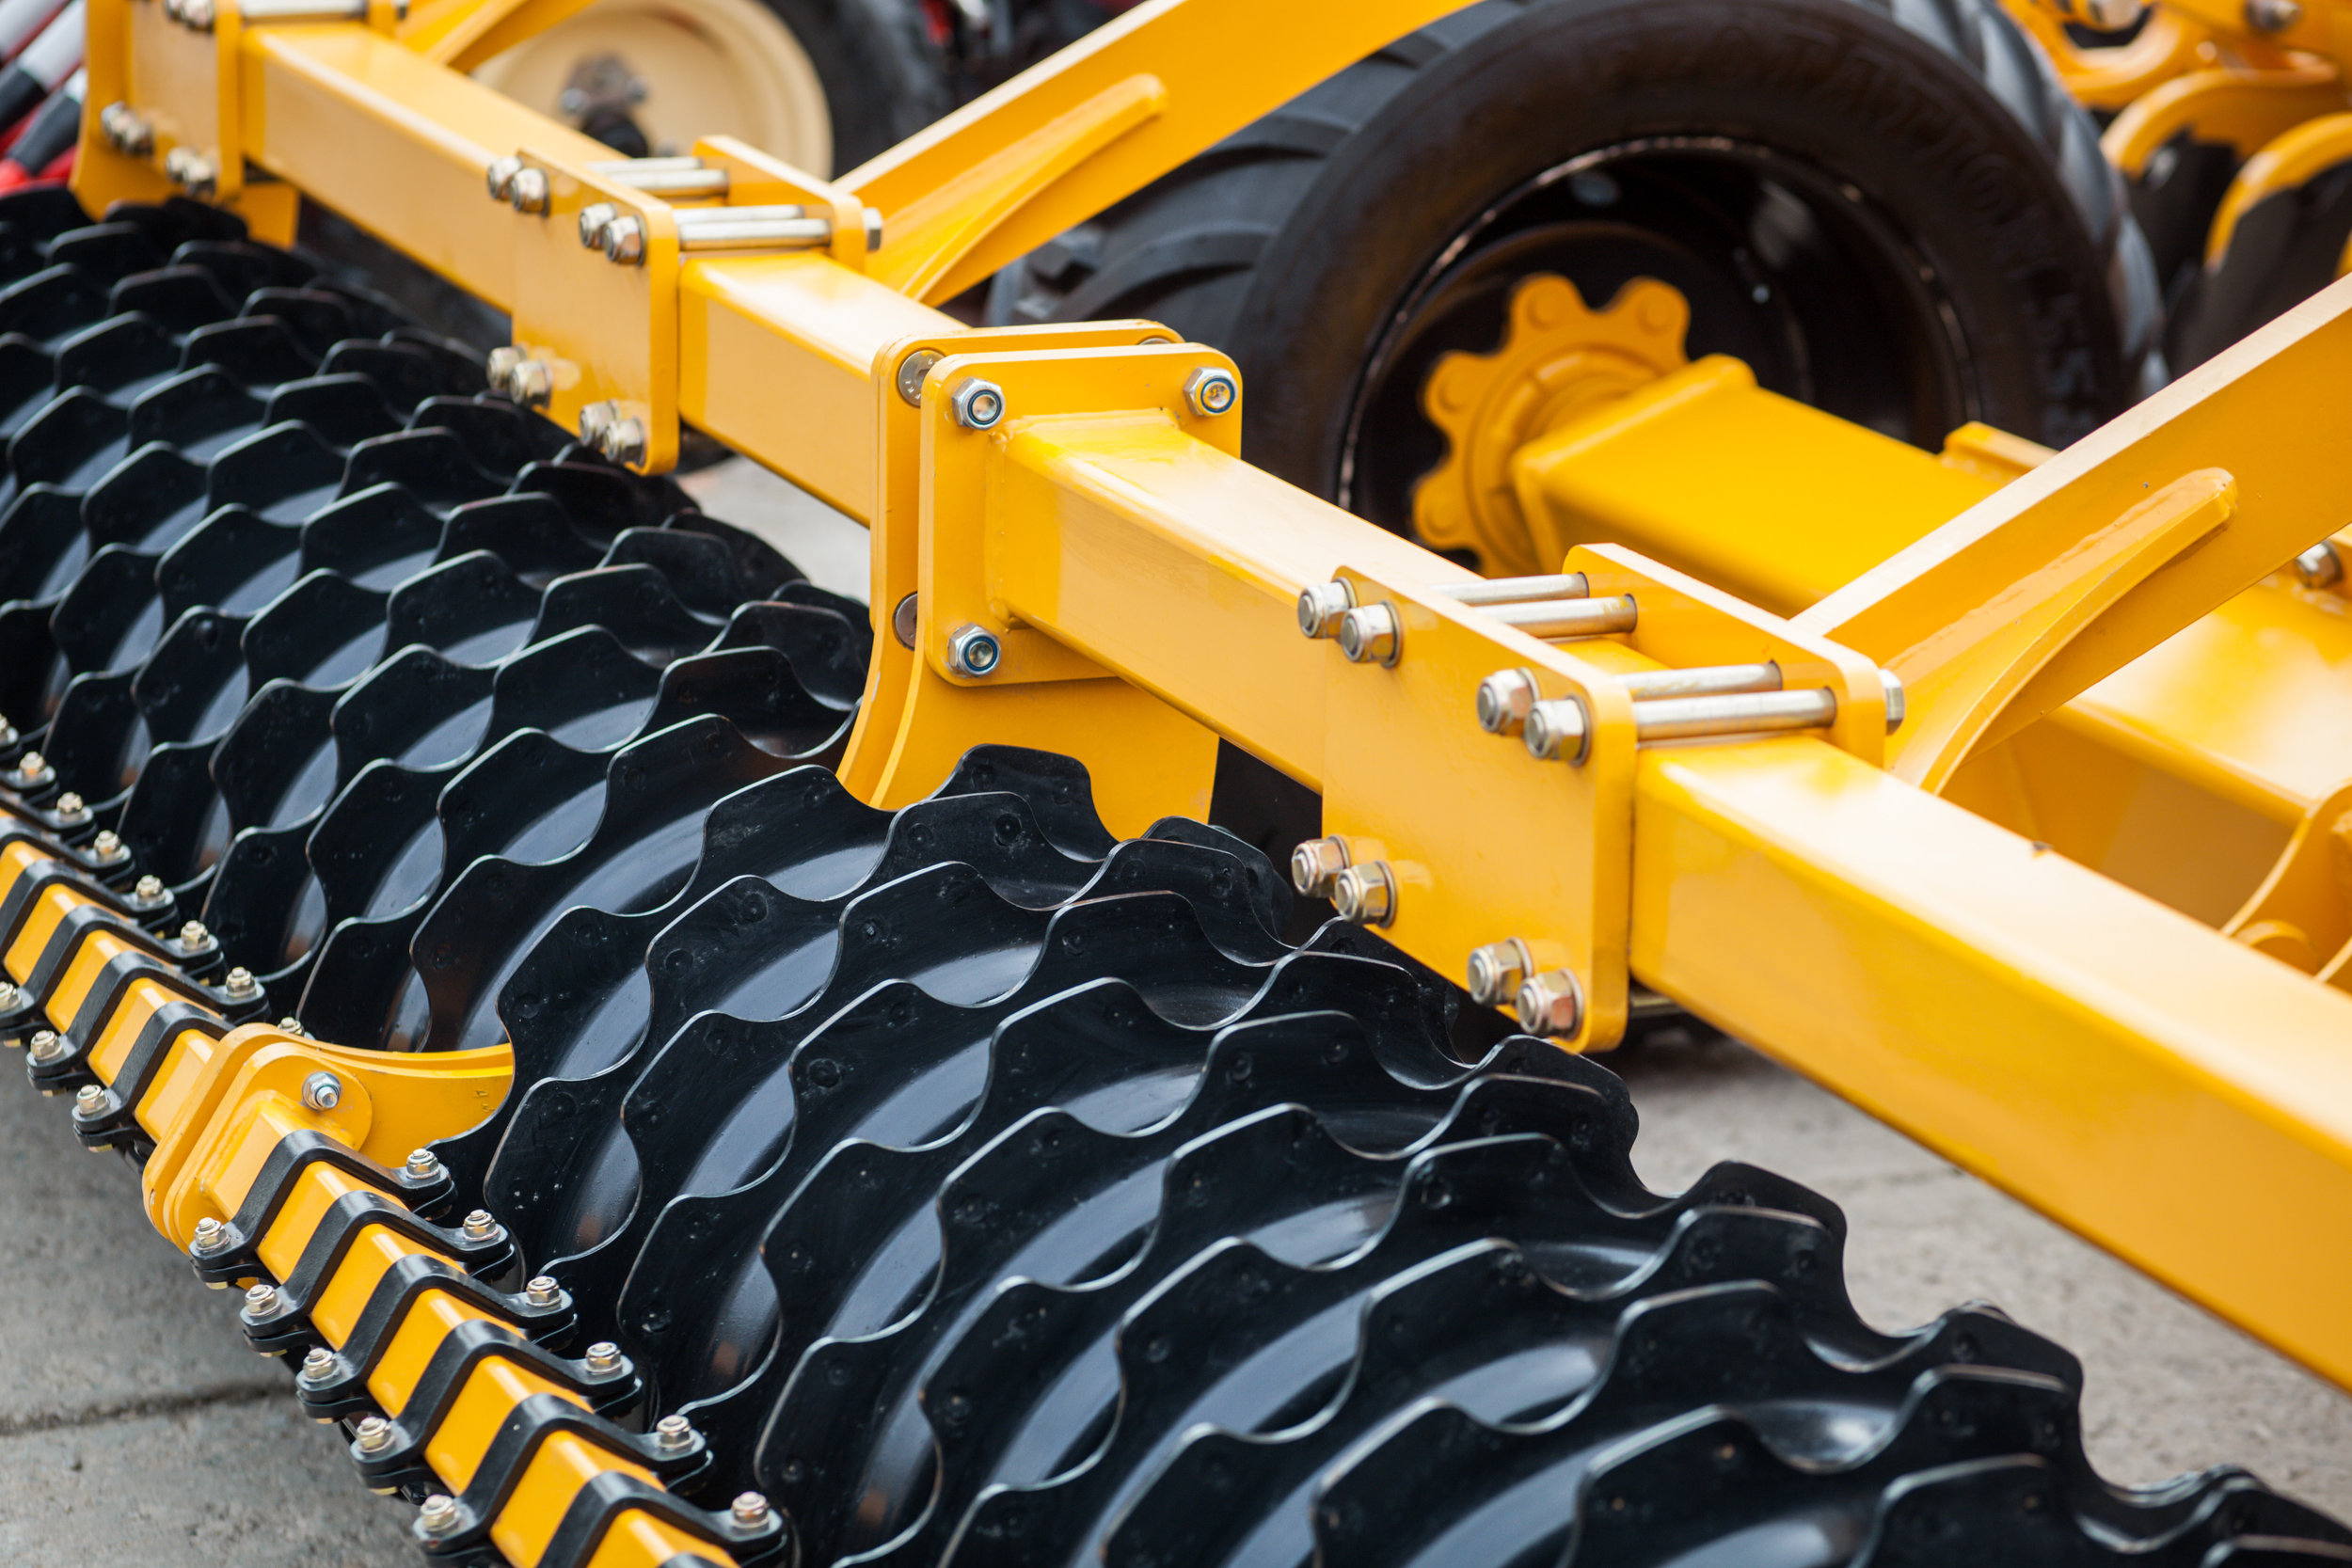 Heavy farming equipment